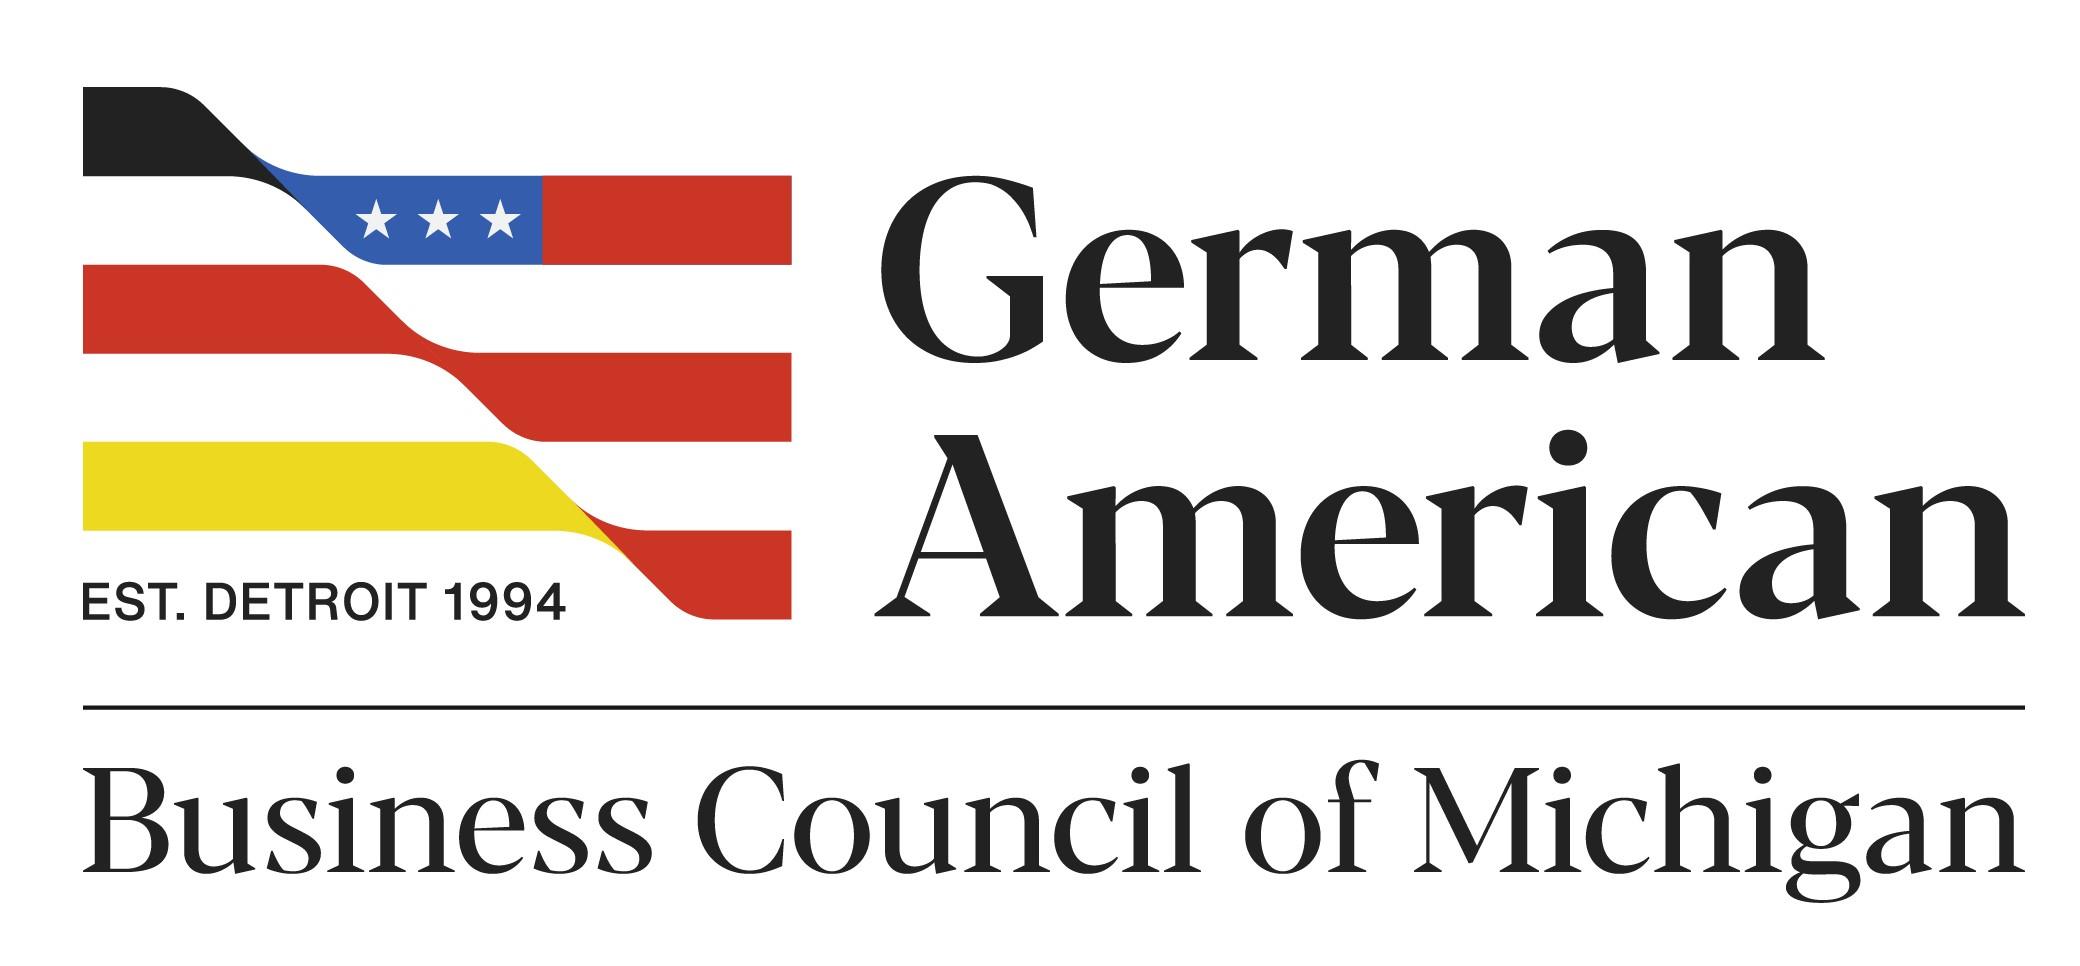 German American Business Council of Michigan